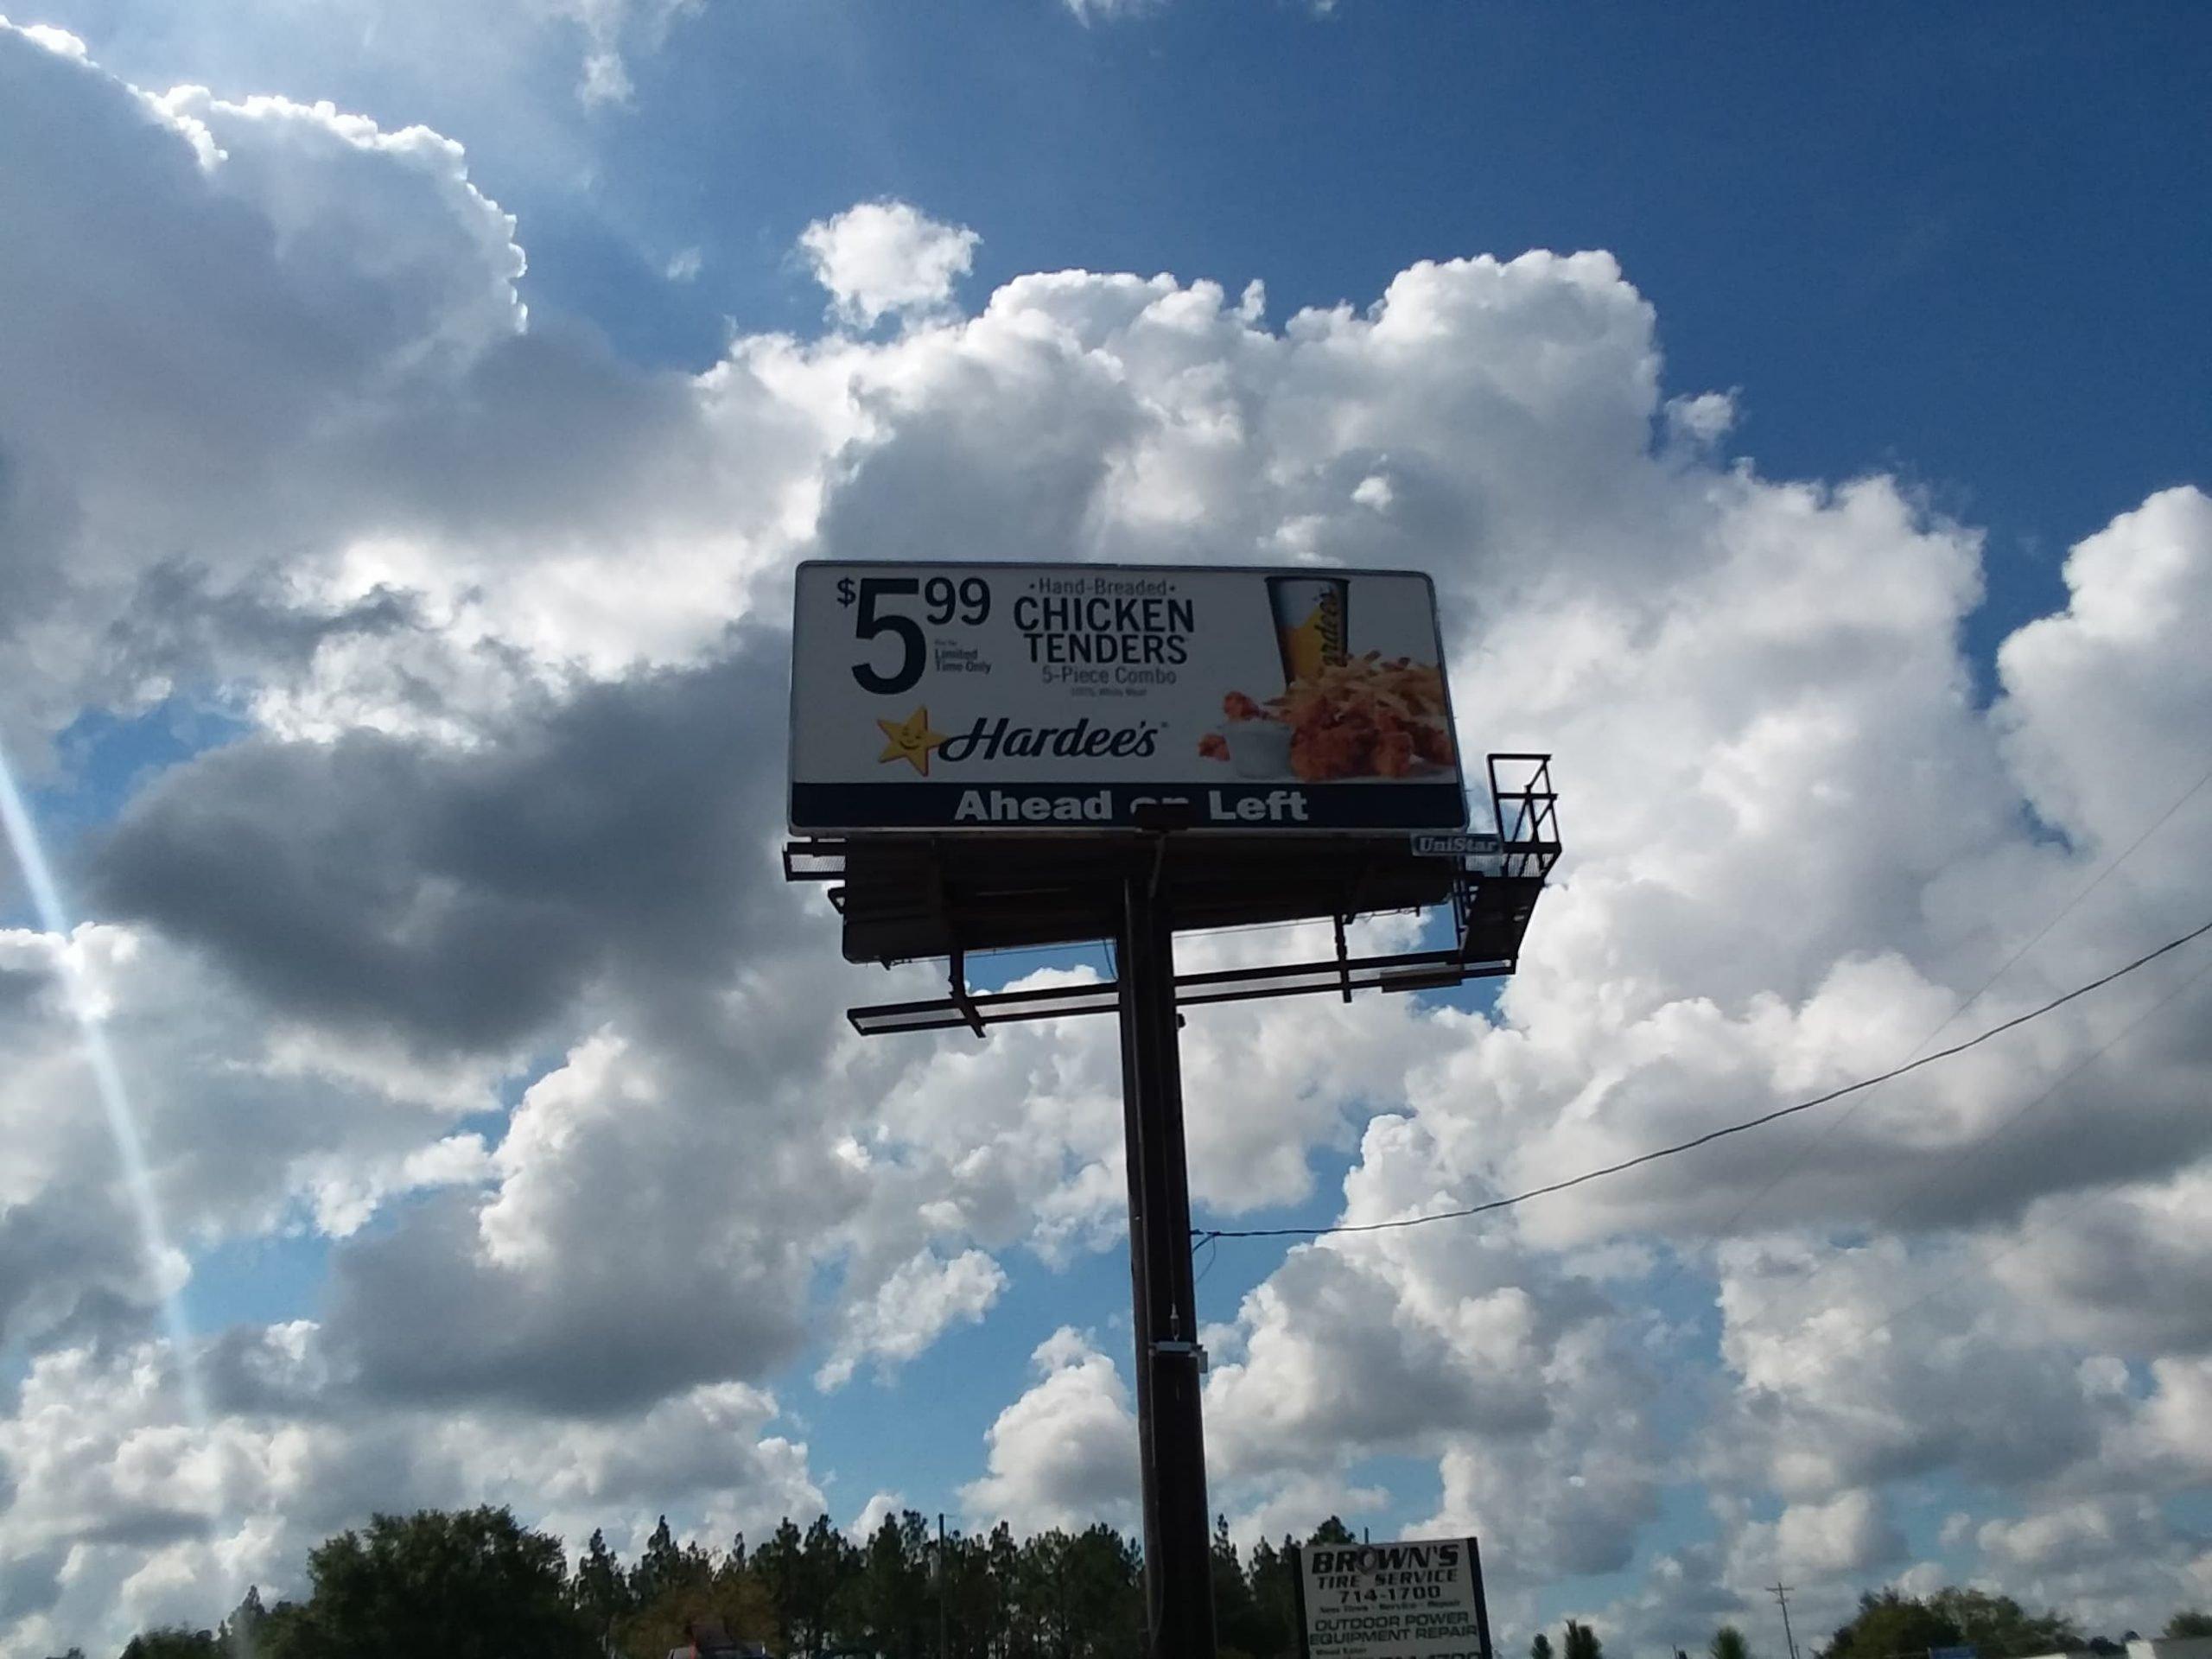 Outdoor-Advertising-Oct-9-19-Sign #SC264.2SB LHR - CU -- 10-4-18